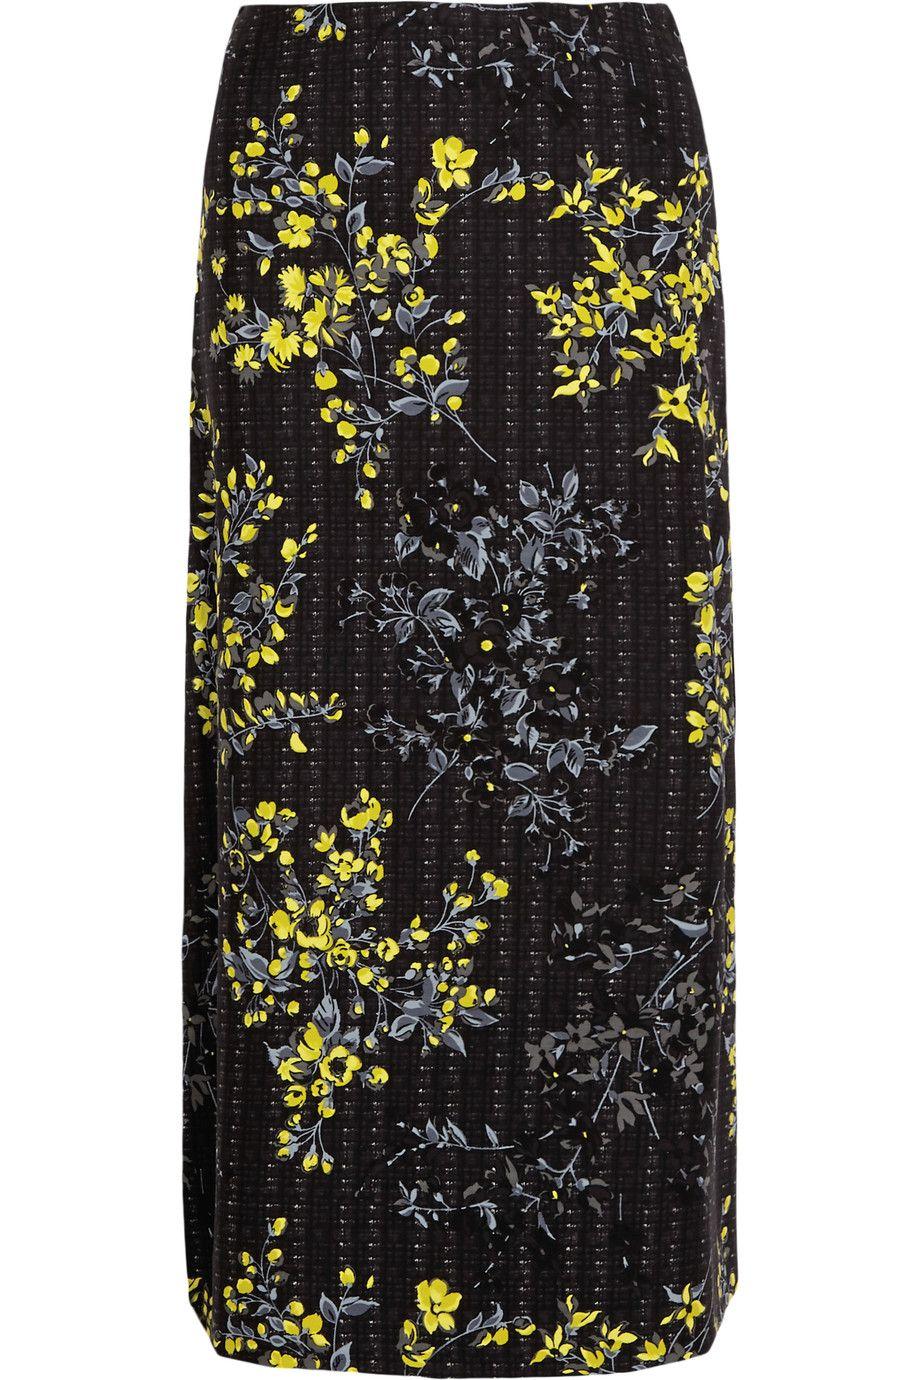 bb7acdca0 MARNI Floral-Print Cotton, Wool And Silk-Blend Skirt. #marni #cloth #skirt